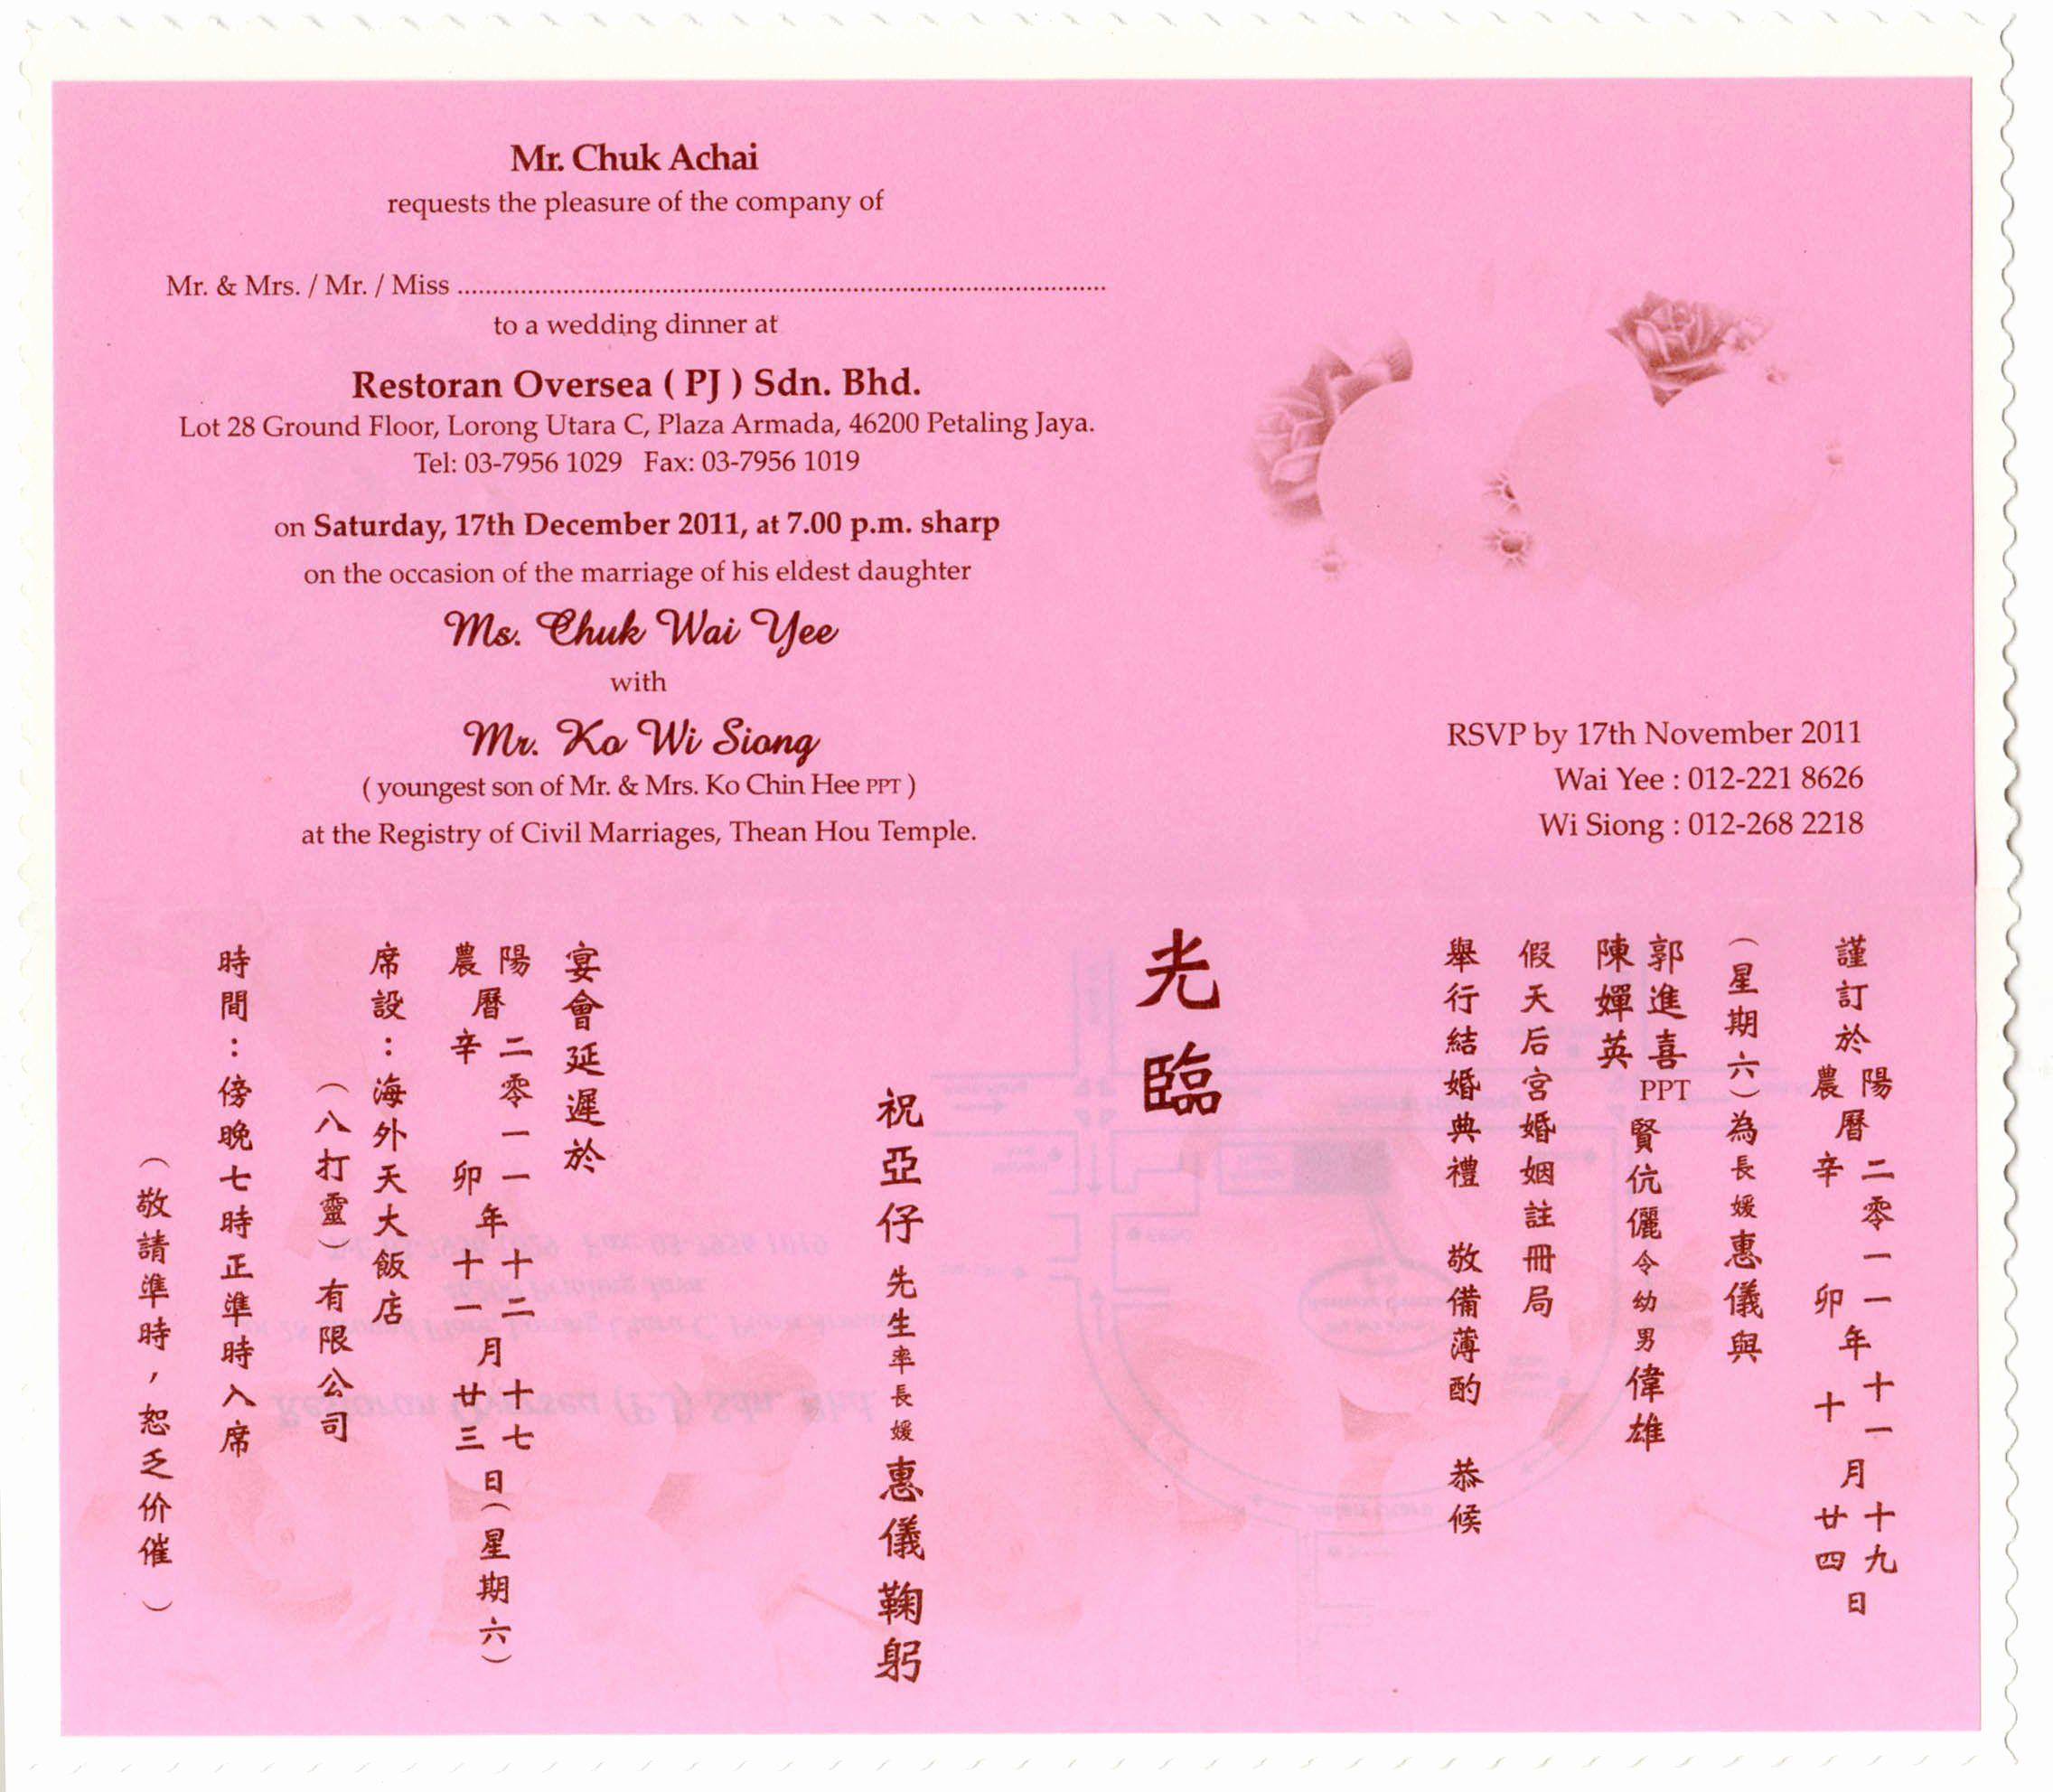 Chinese Wedding Invitation Wording Template Chinese Wedding Invitation Wedding Invitation Templates Wedding Invitations